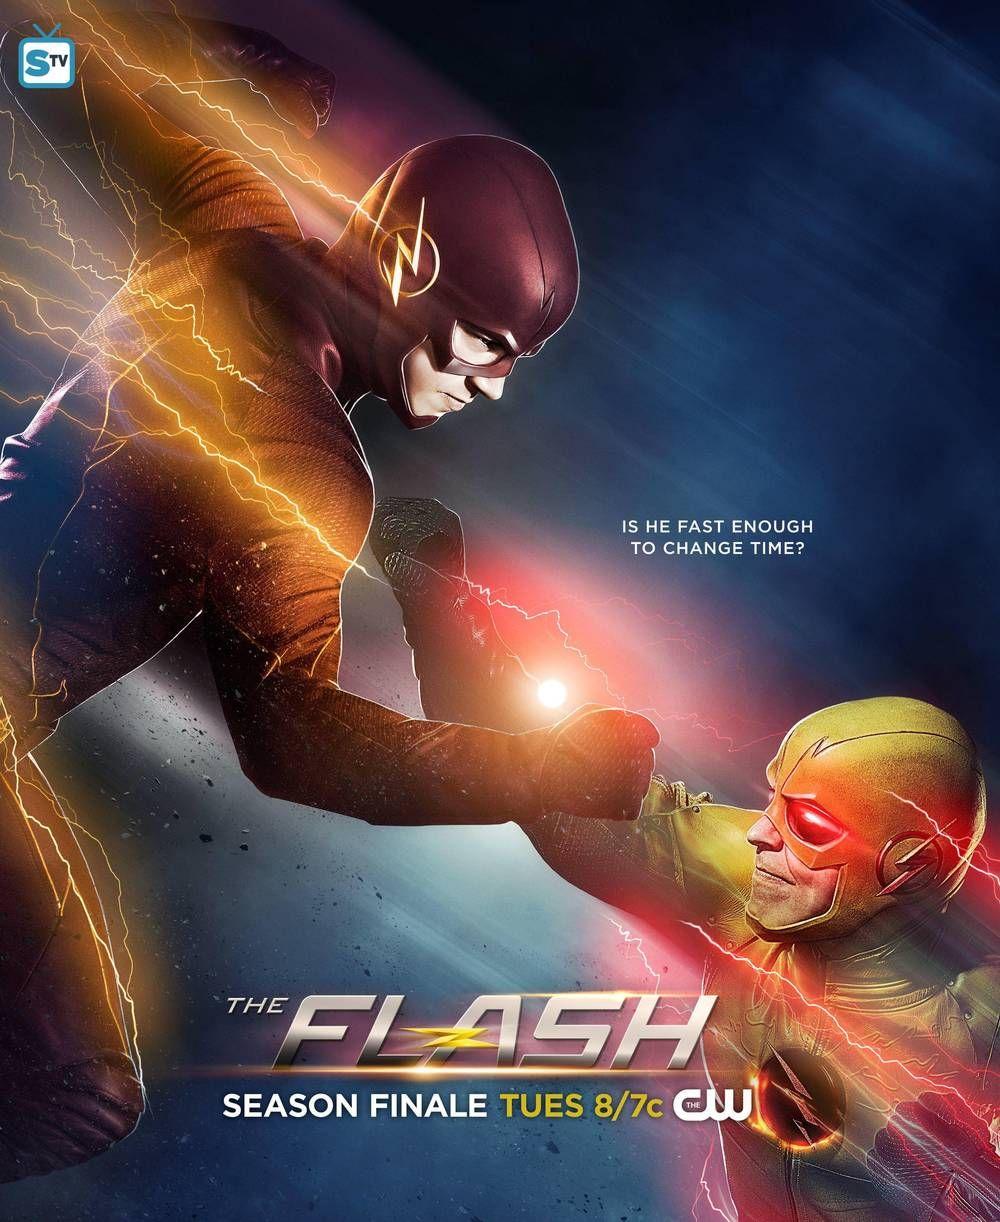 The Flash Season Finale Promo Spot Fast Enough Imagenes De